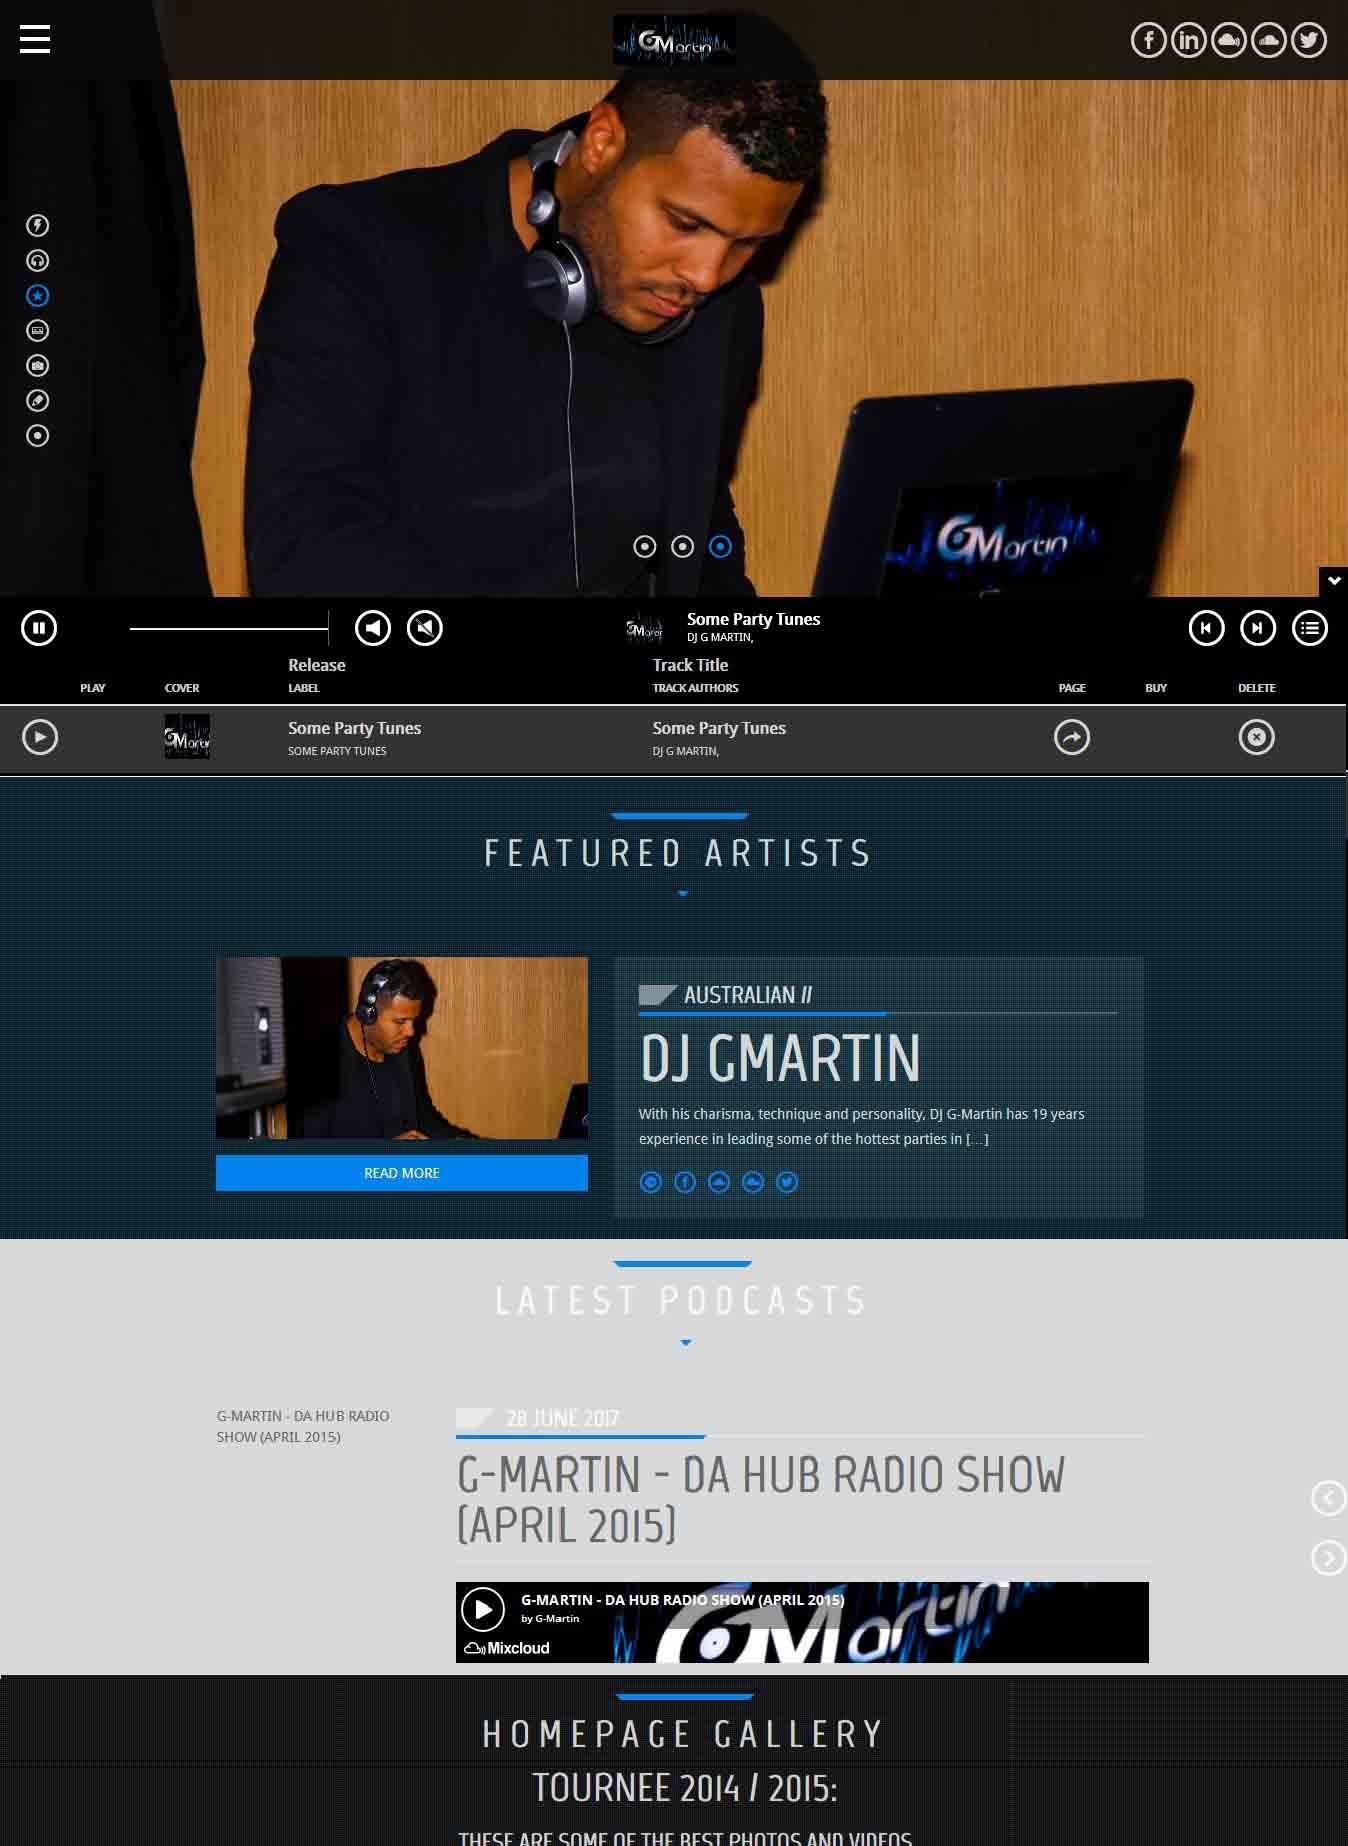 debsite design for DJ G-Martin by Lumena, Owerri Imo State web design and web development